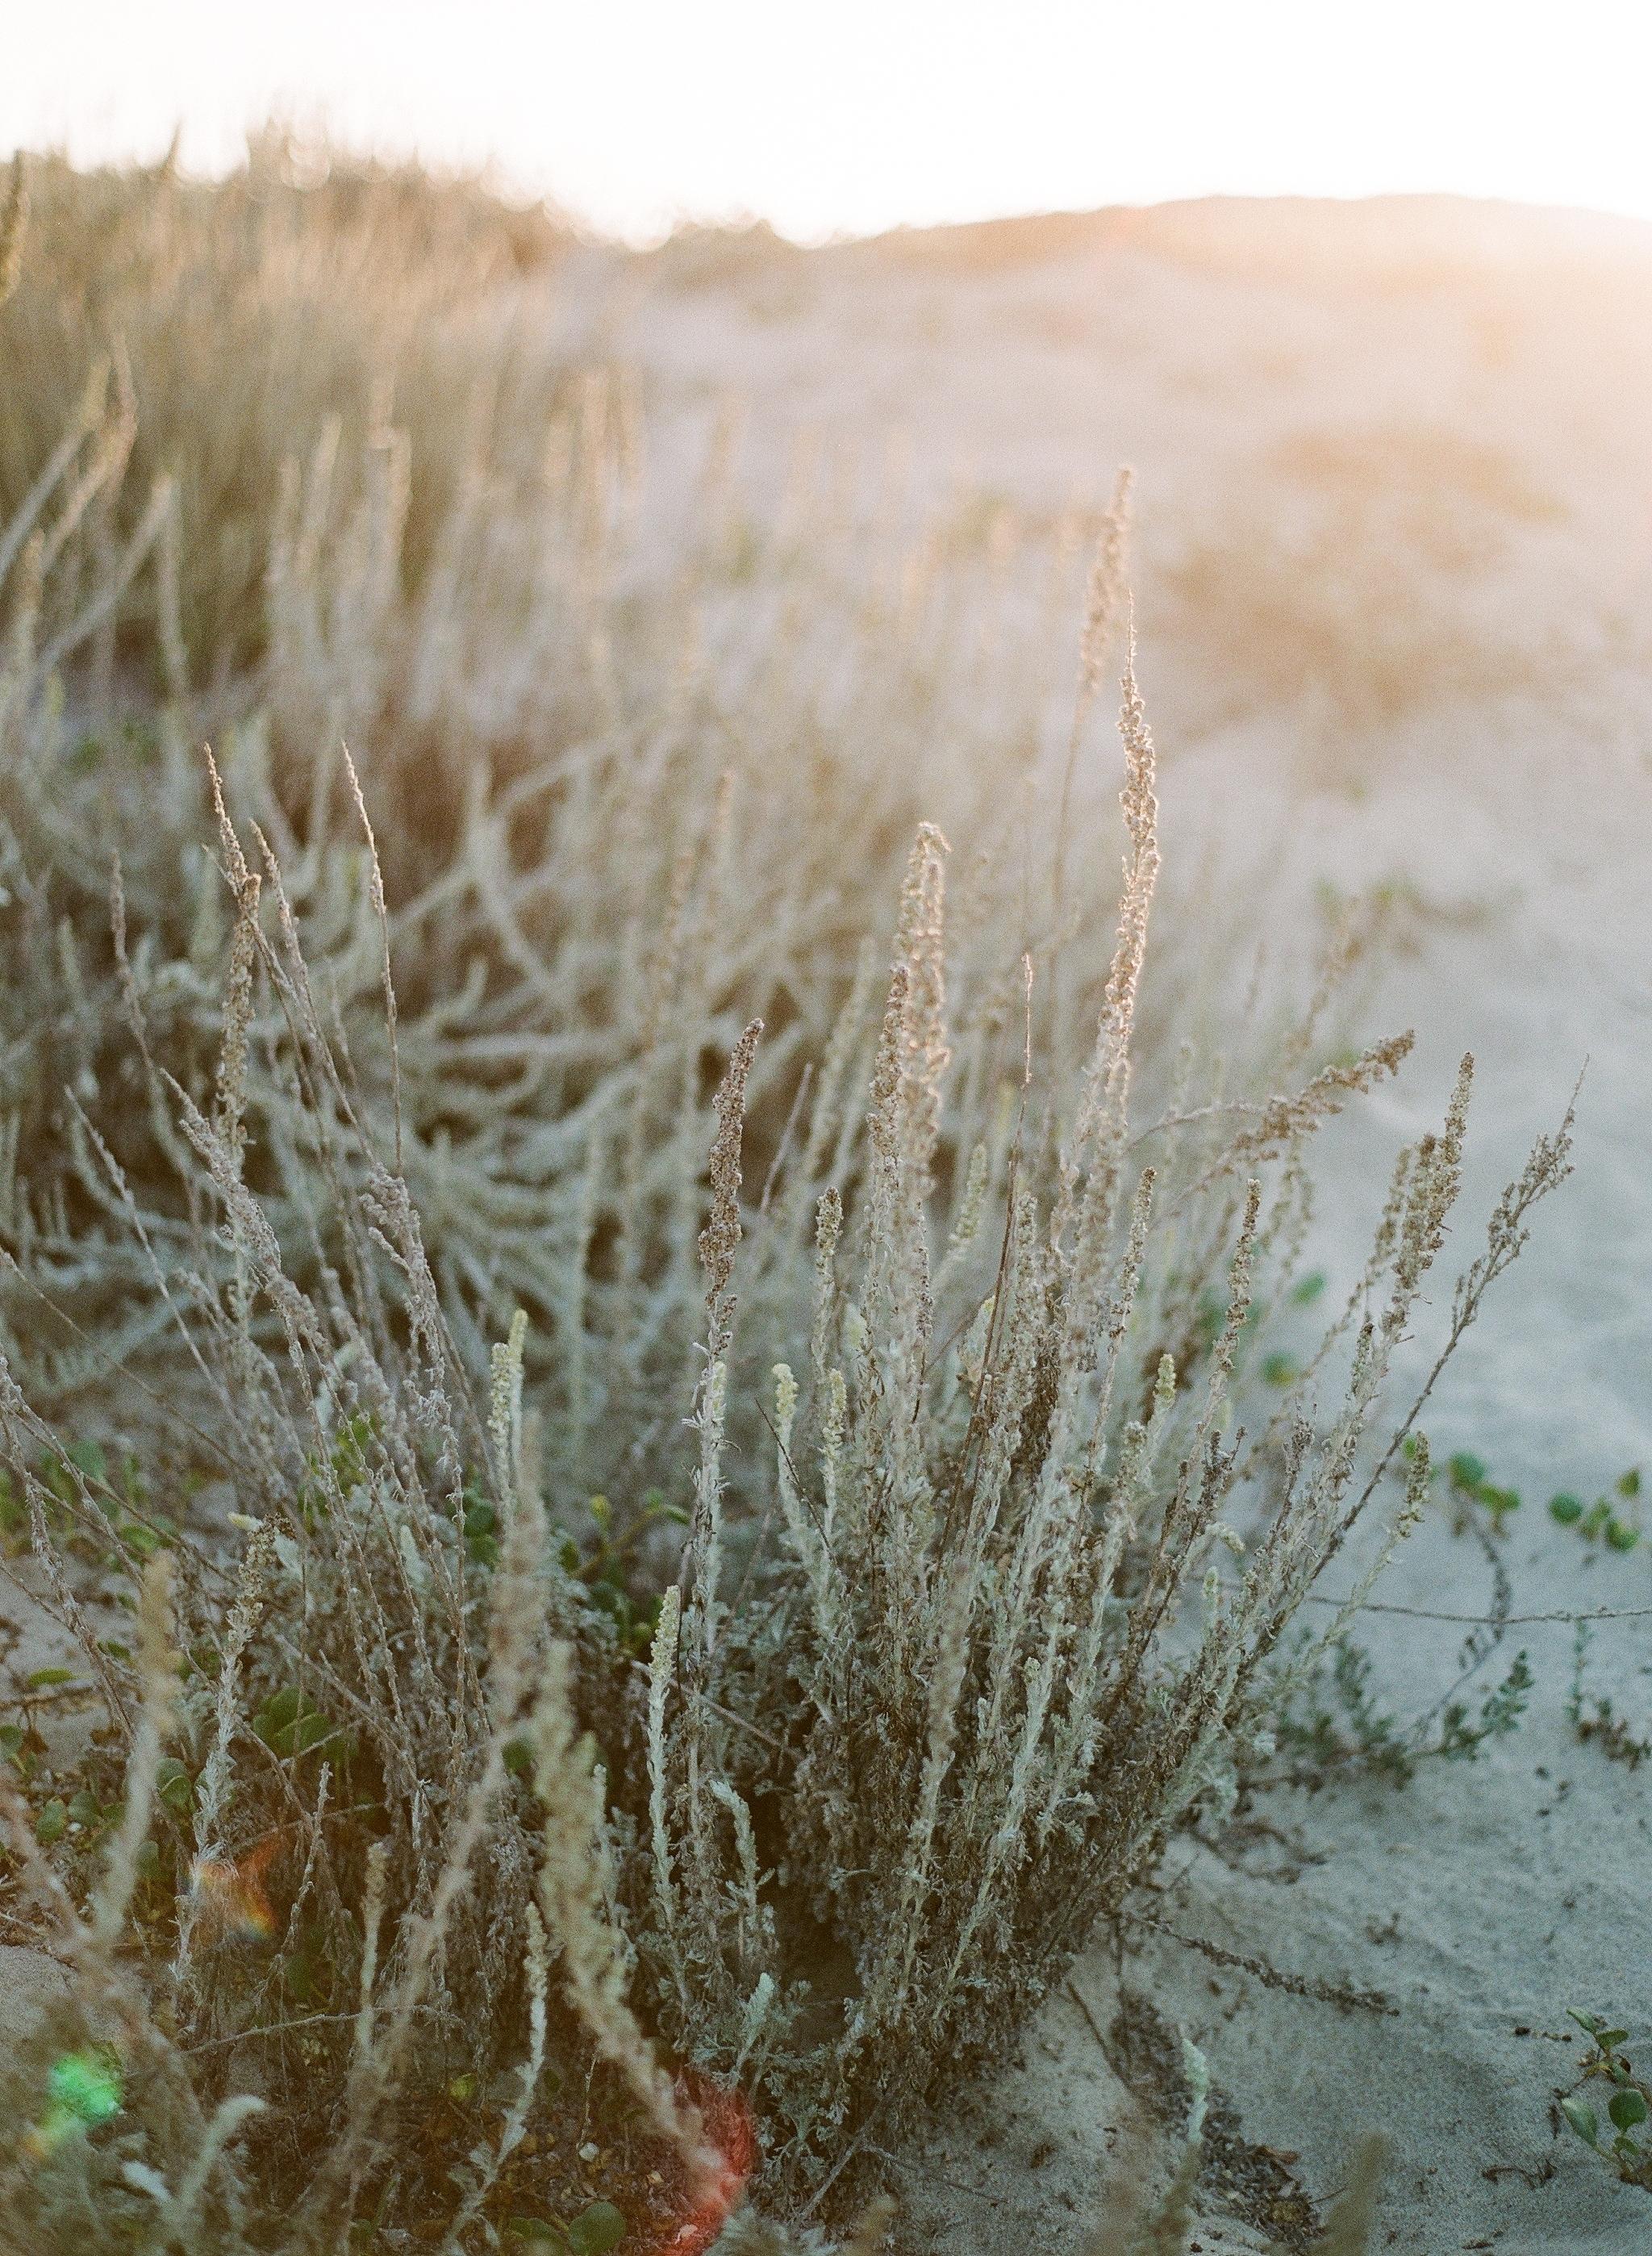 The plants near Moss Landing, California